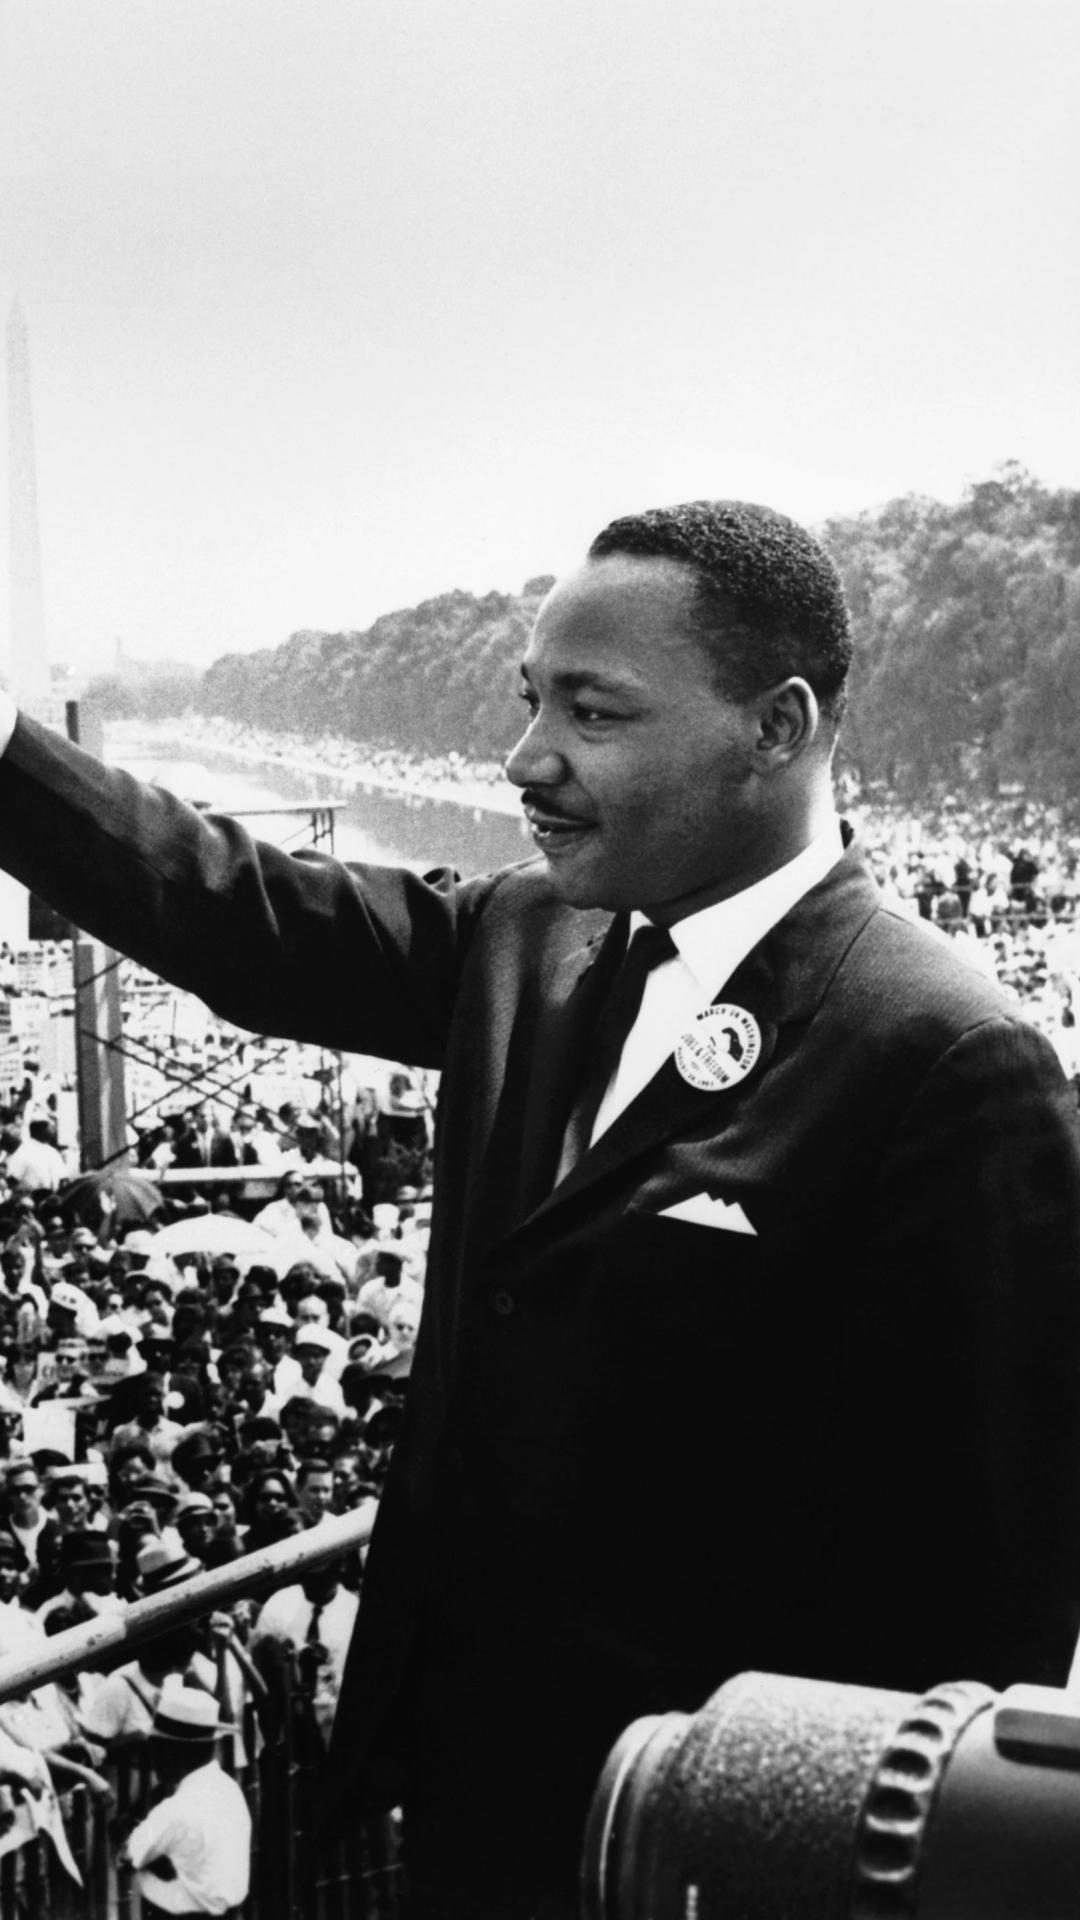 Men Martin Luther King Jr 750x1334 Wallpaper Id 817413 Mobile